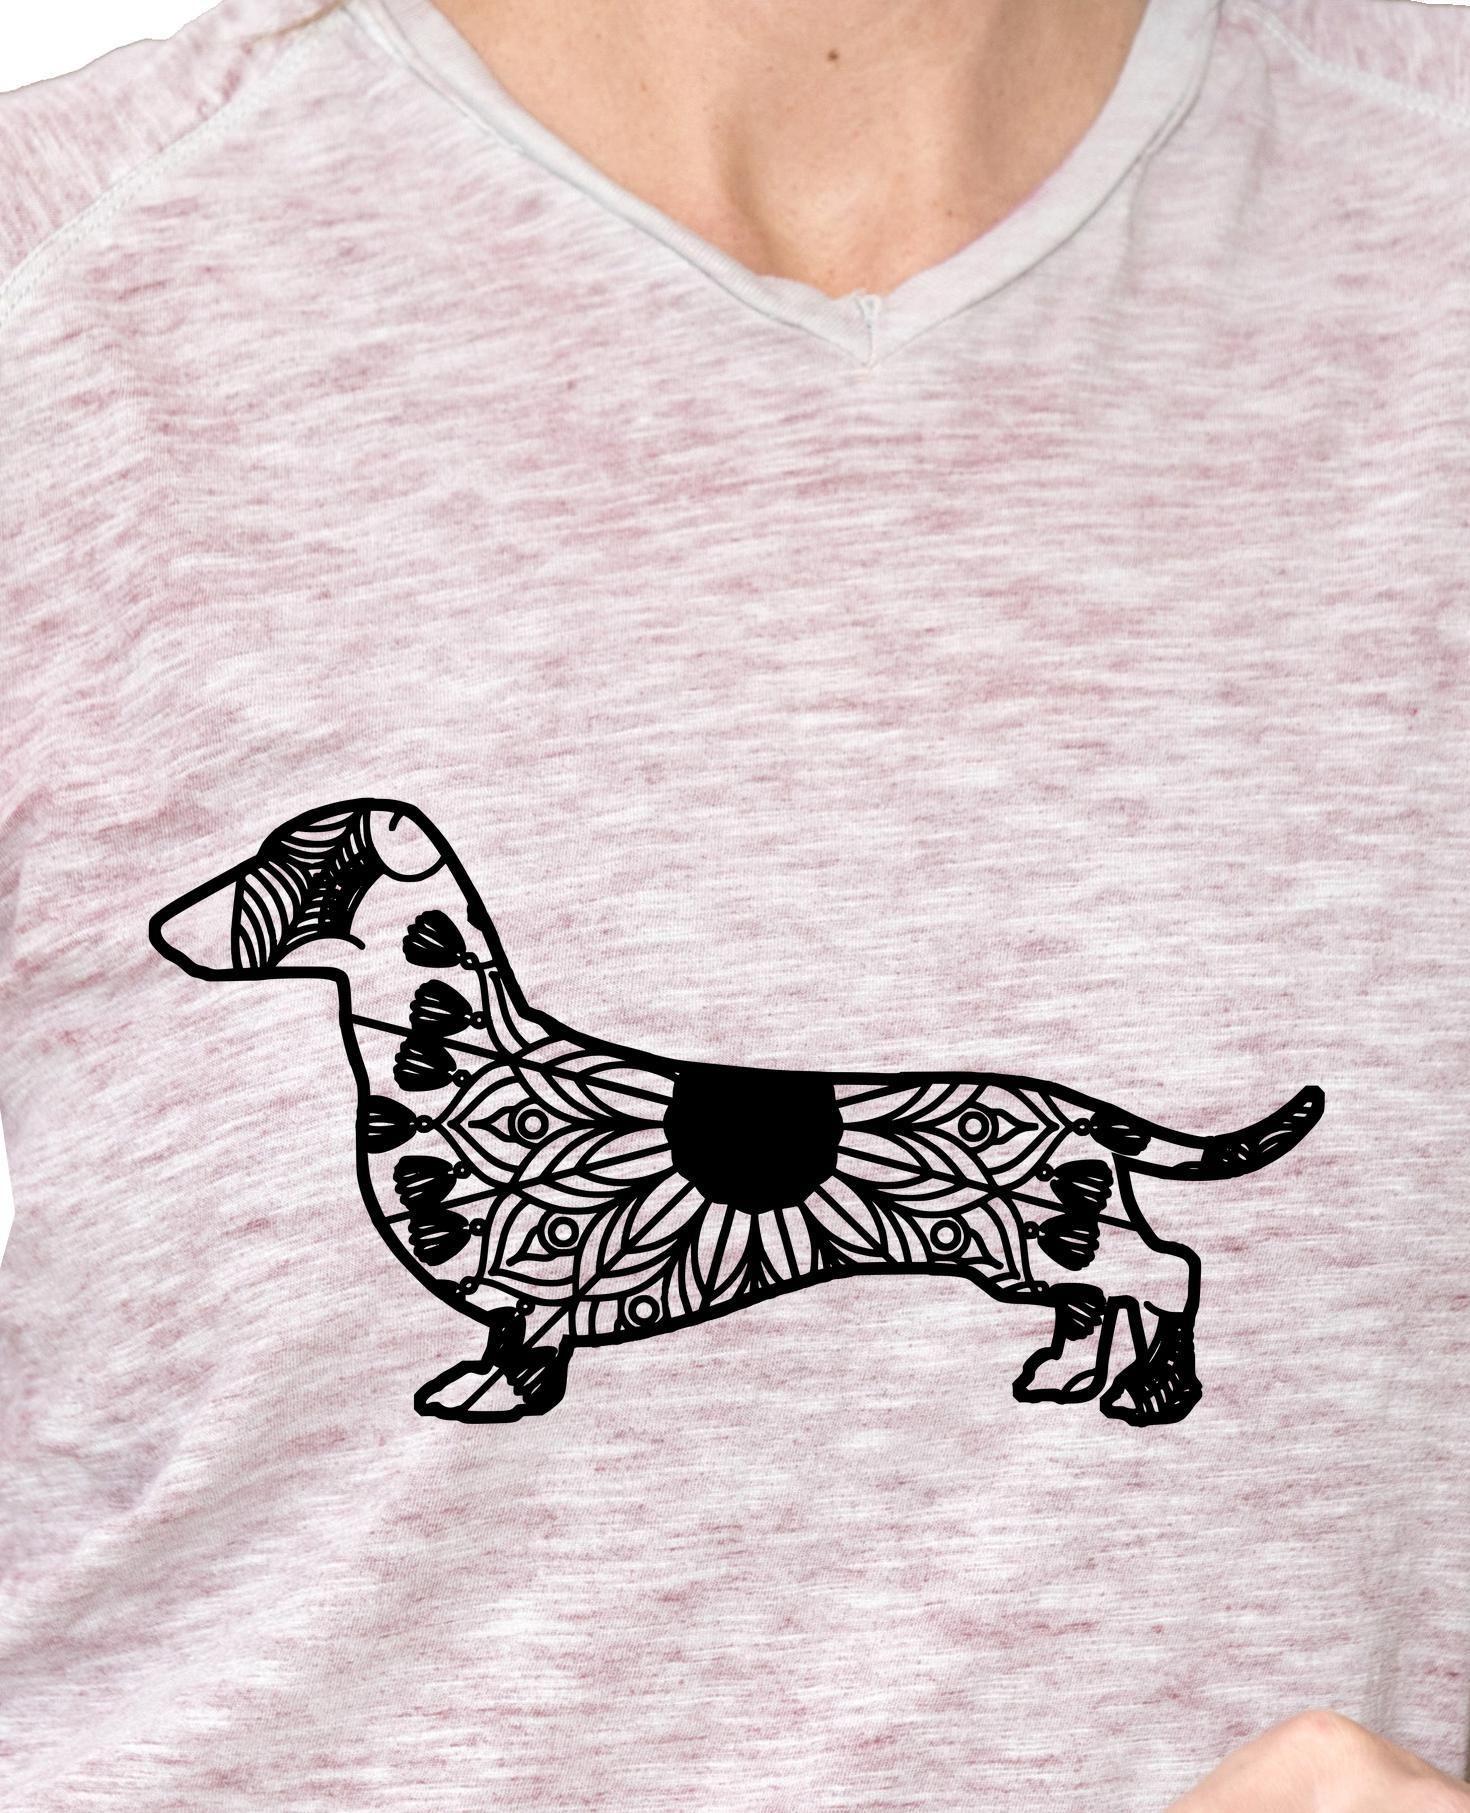 Dachshund Mandala Animal Svg T Shirt Designs Dachshund Tattoo